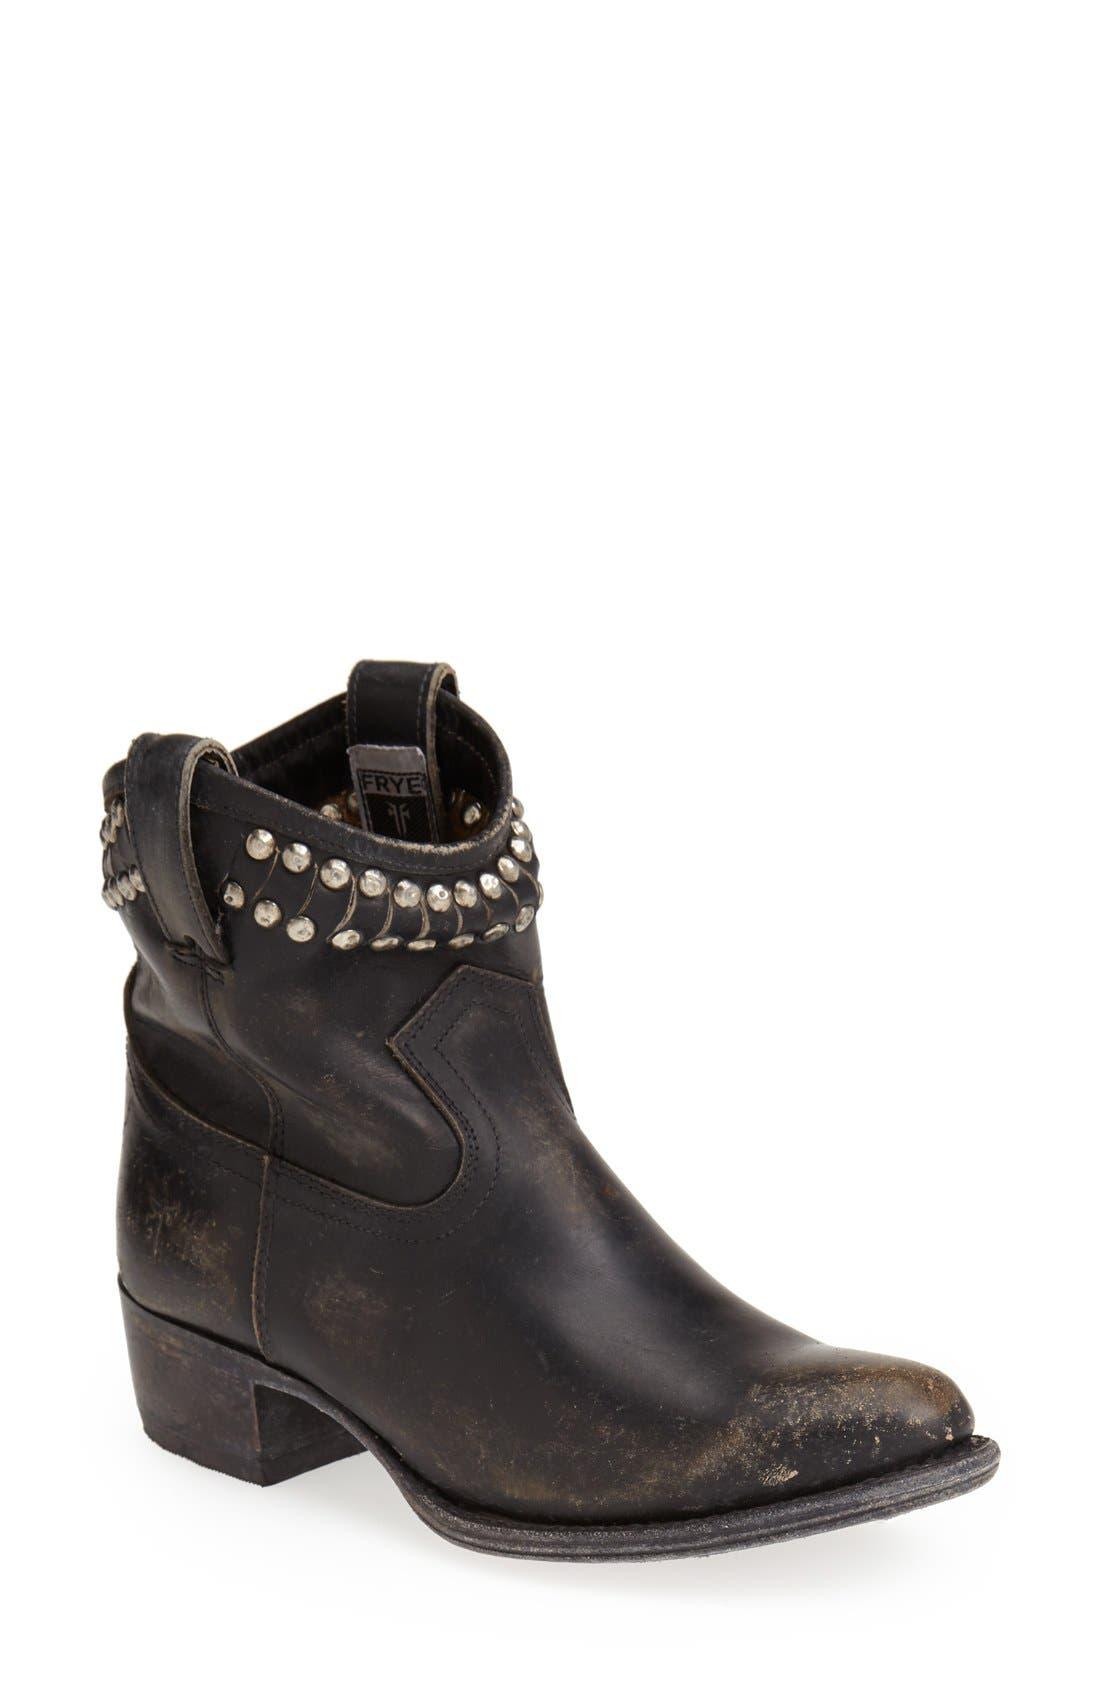 Main Image - Frye 'Diana' Cut & Studded Leather Short Boot (Women)